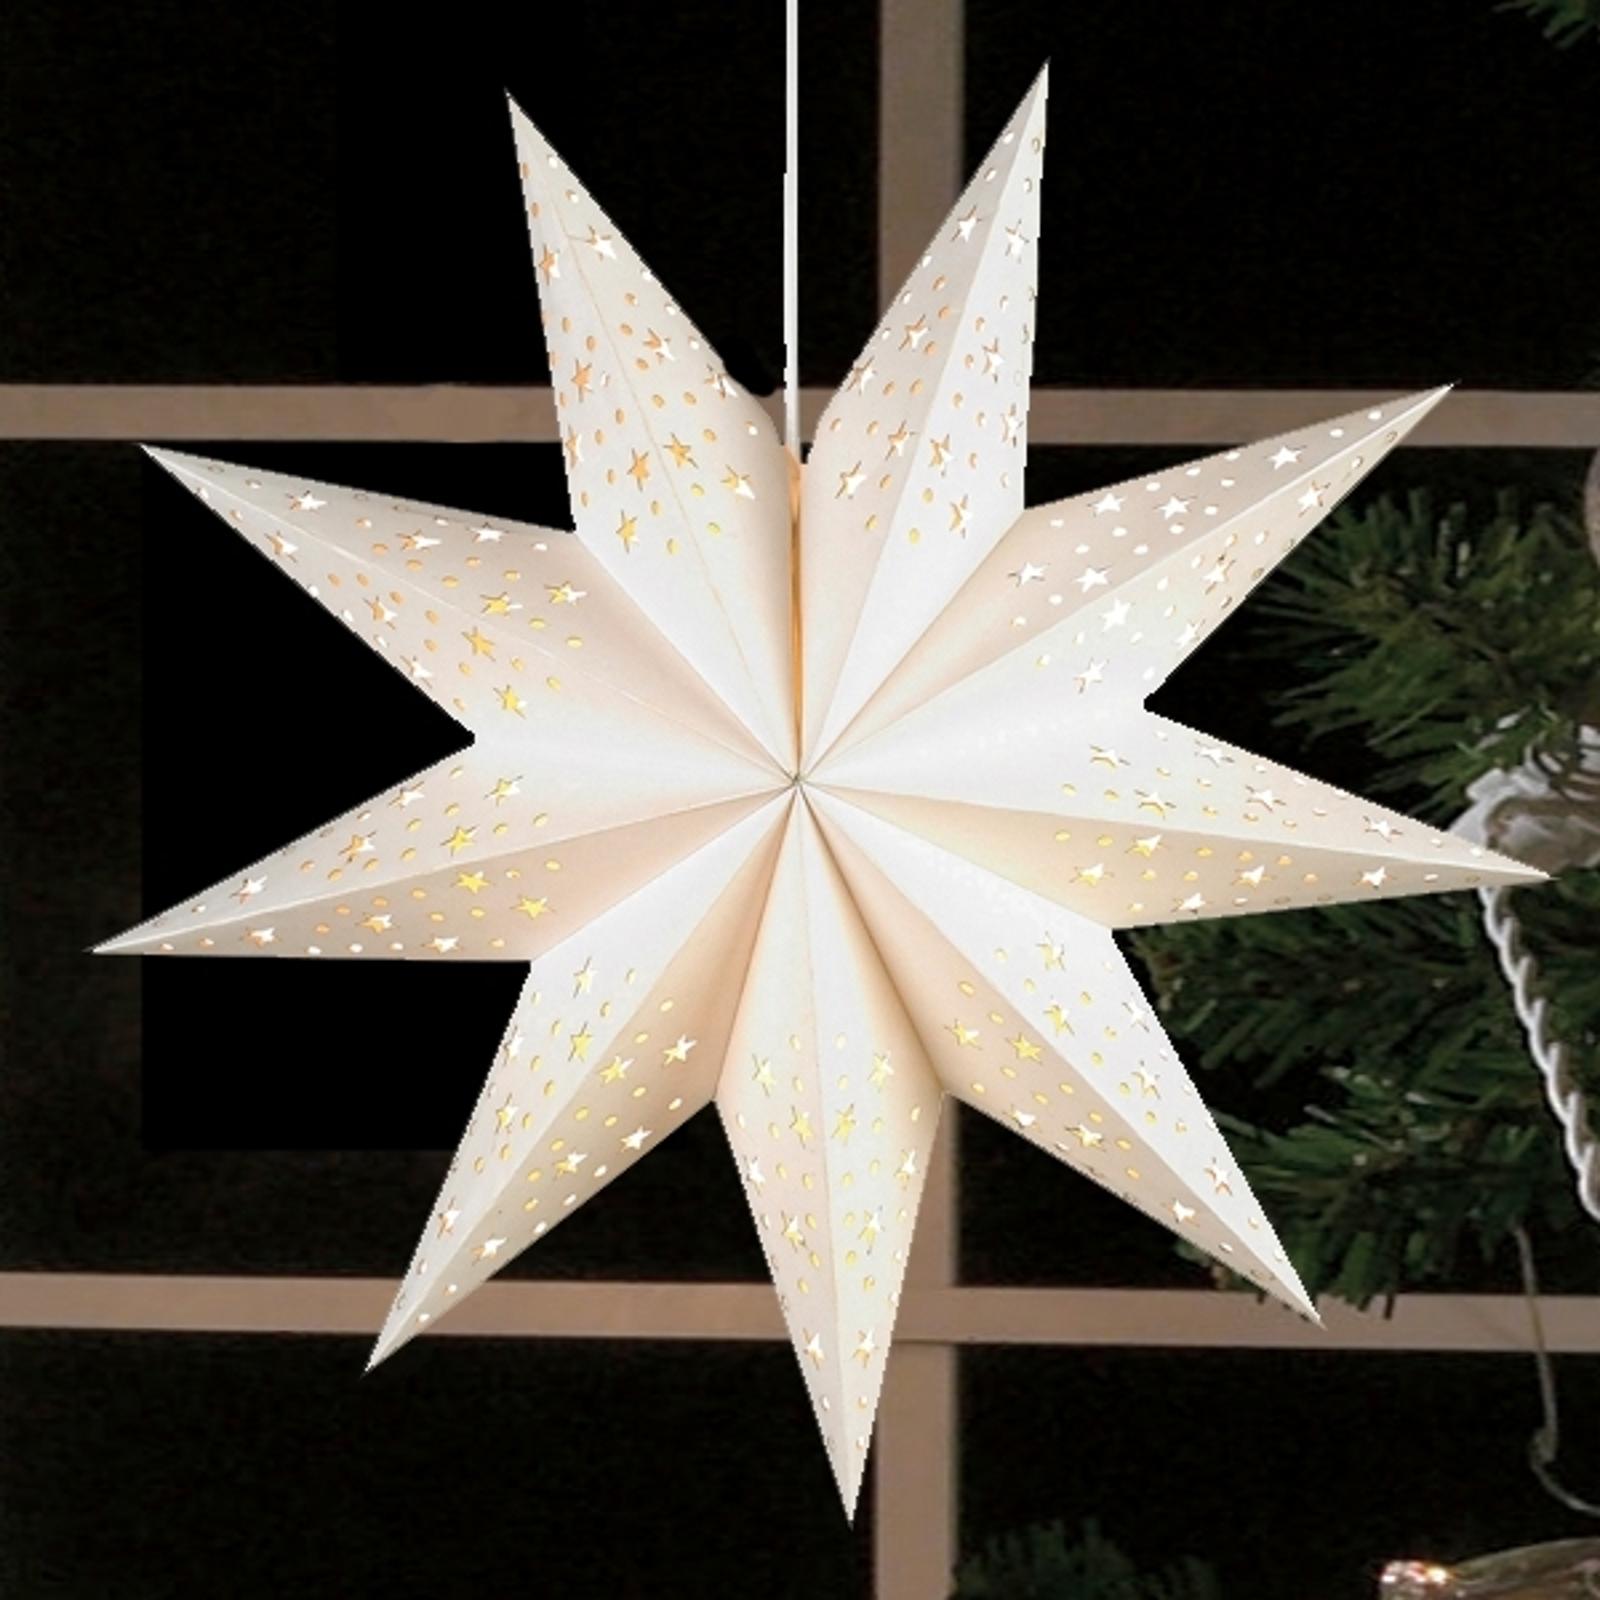 Splendida stella Solvalla, 45cm